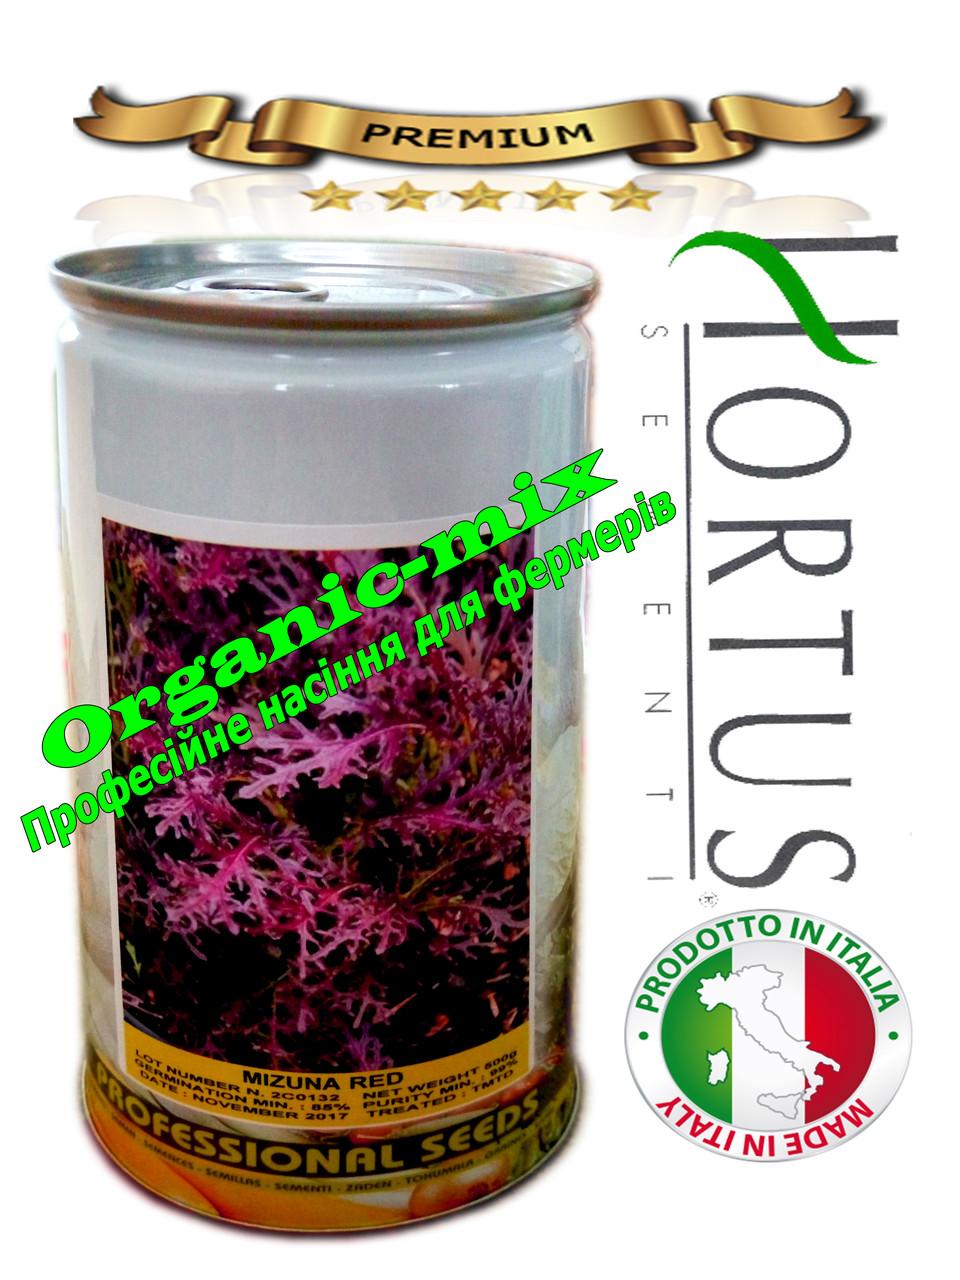 Салат Мизуна красная / Mizuno red ТМ «Hortus» (Италия), банка 500 грамм